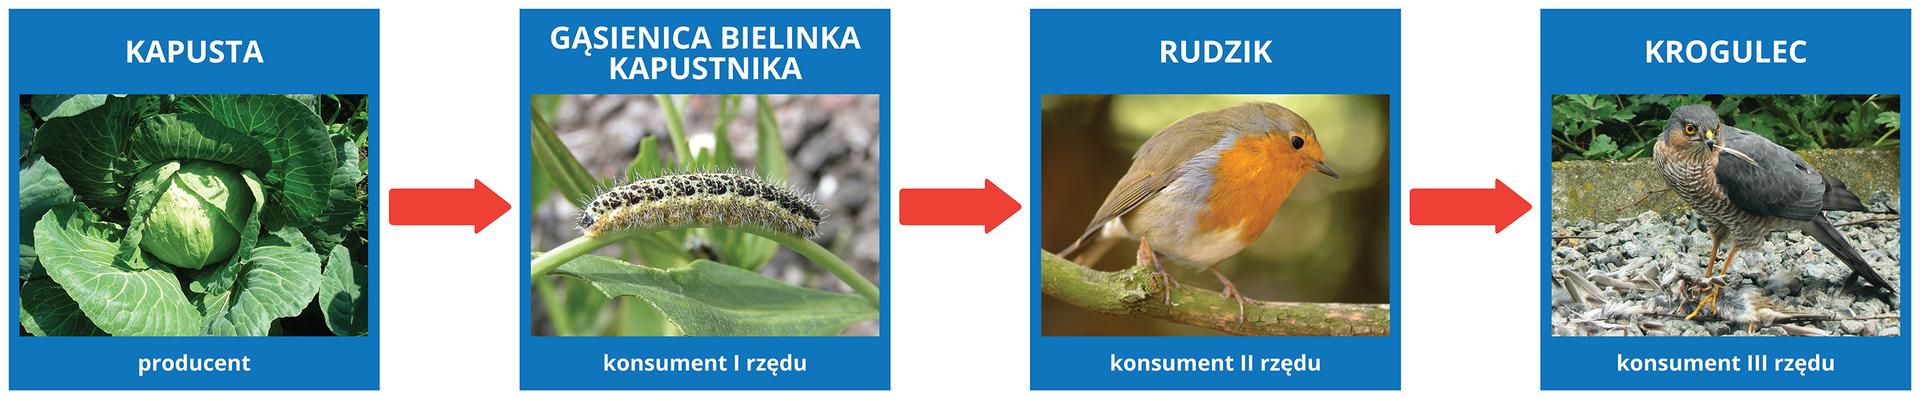 liść kapusty - gąsienica bielinka kapustnika - rudzik - krogulec.